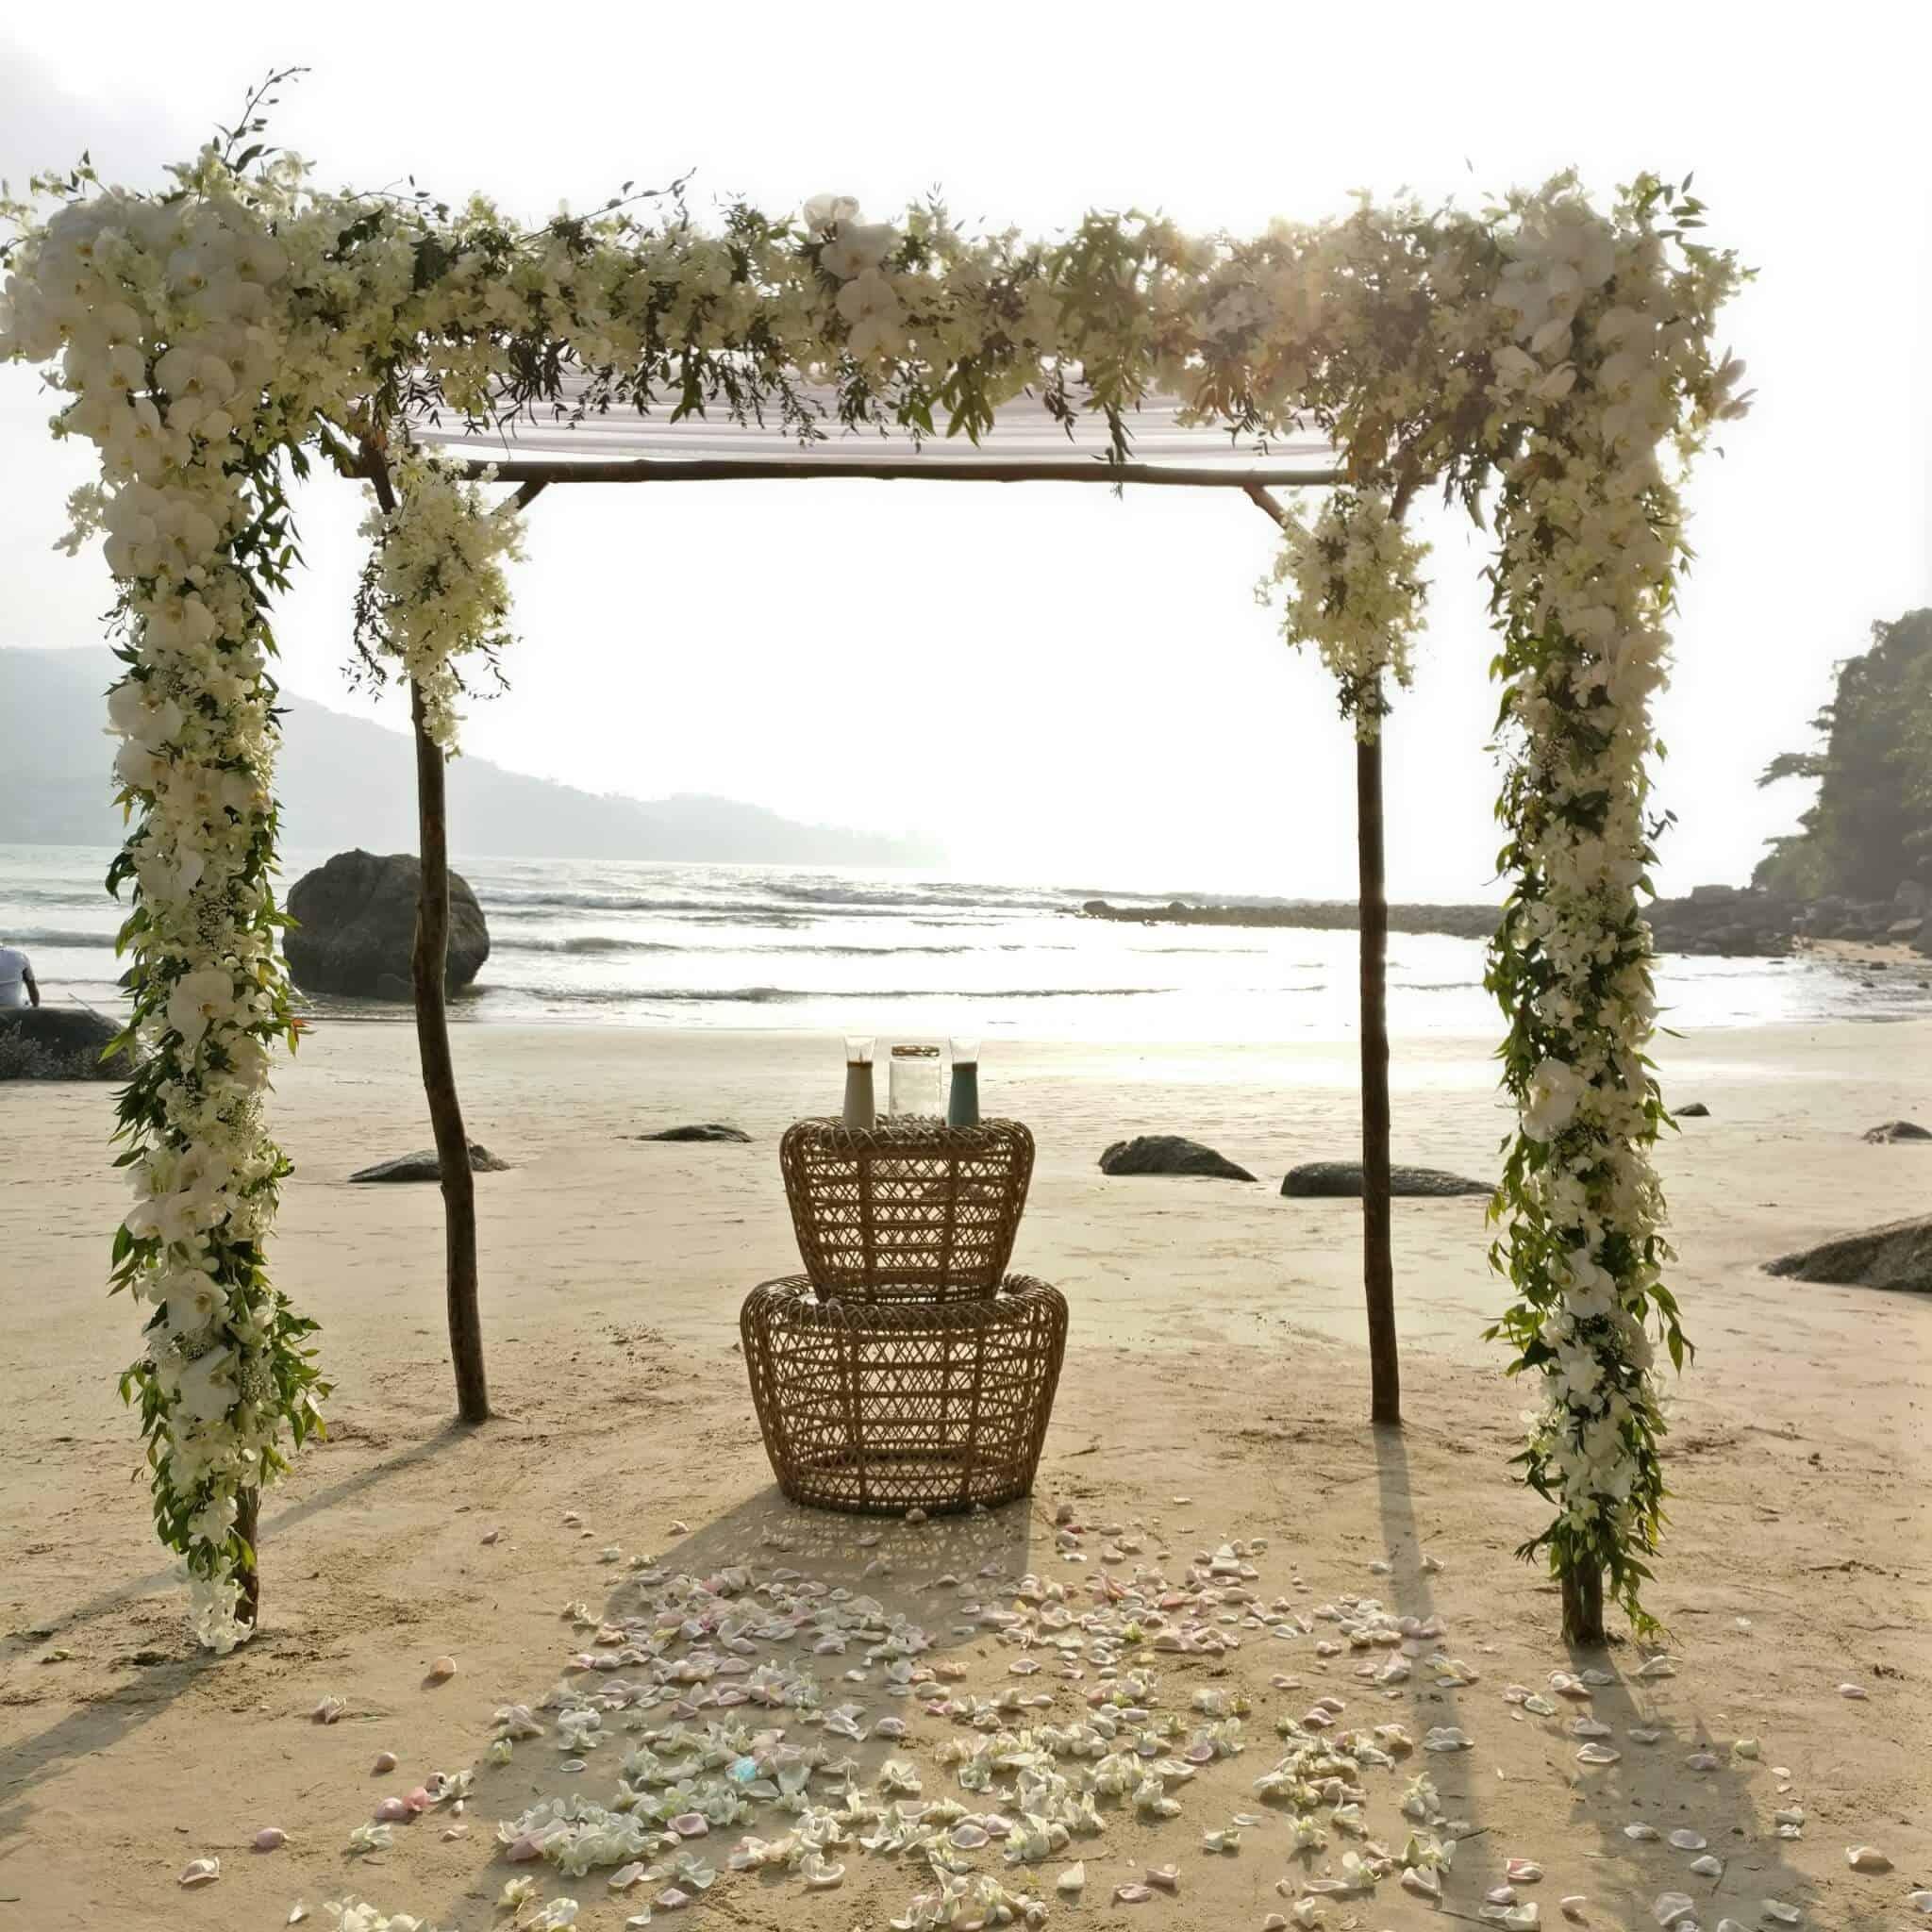 Unique phuket wedding planners beach bamboo gazebo (10)